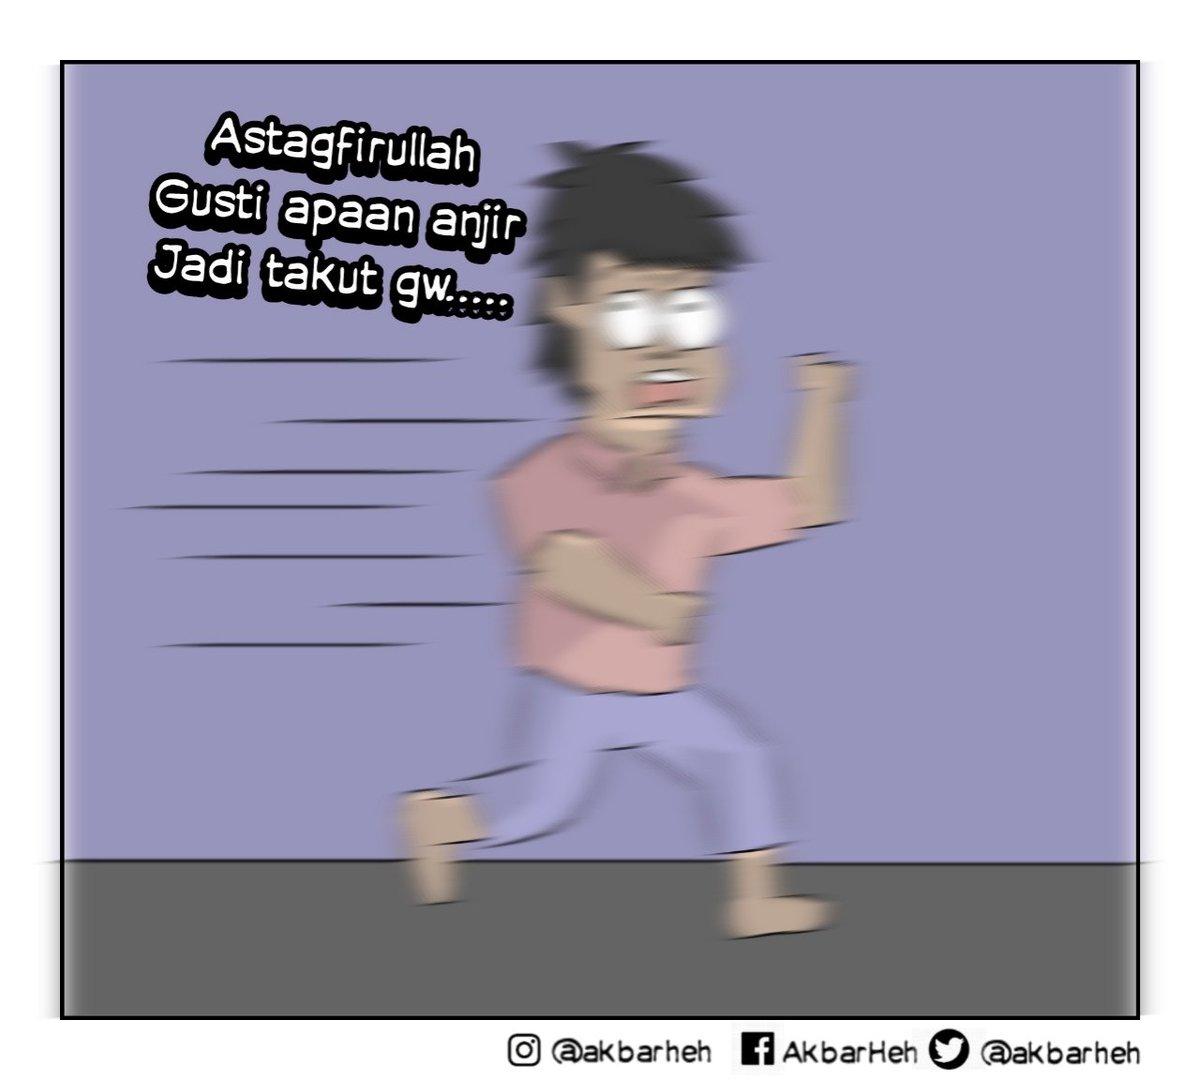 The real uji nyali semaleman (terusan) .  Jangan lupa follow @akbarheh . . . #komikinaja #komikindo #komikindonesia #idntoon #komiklucu #komikharian #komikngakak #ngakakkocak #komikviral  #viral #indonesia #komikharian_ #komiksederhana #komikhot #siang  #komikzero #komikpolisipic.twitter.com/oGmPrV1fiD